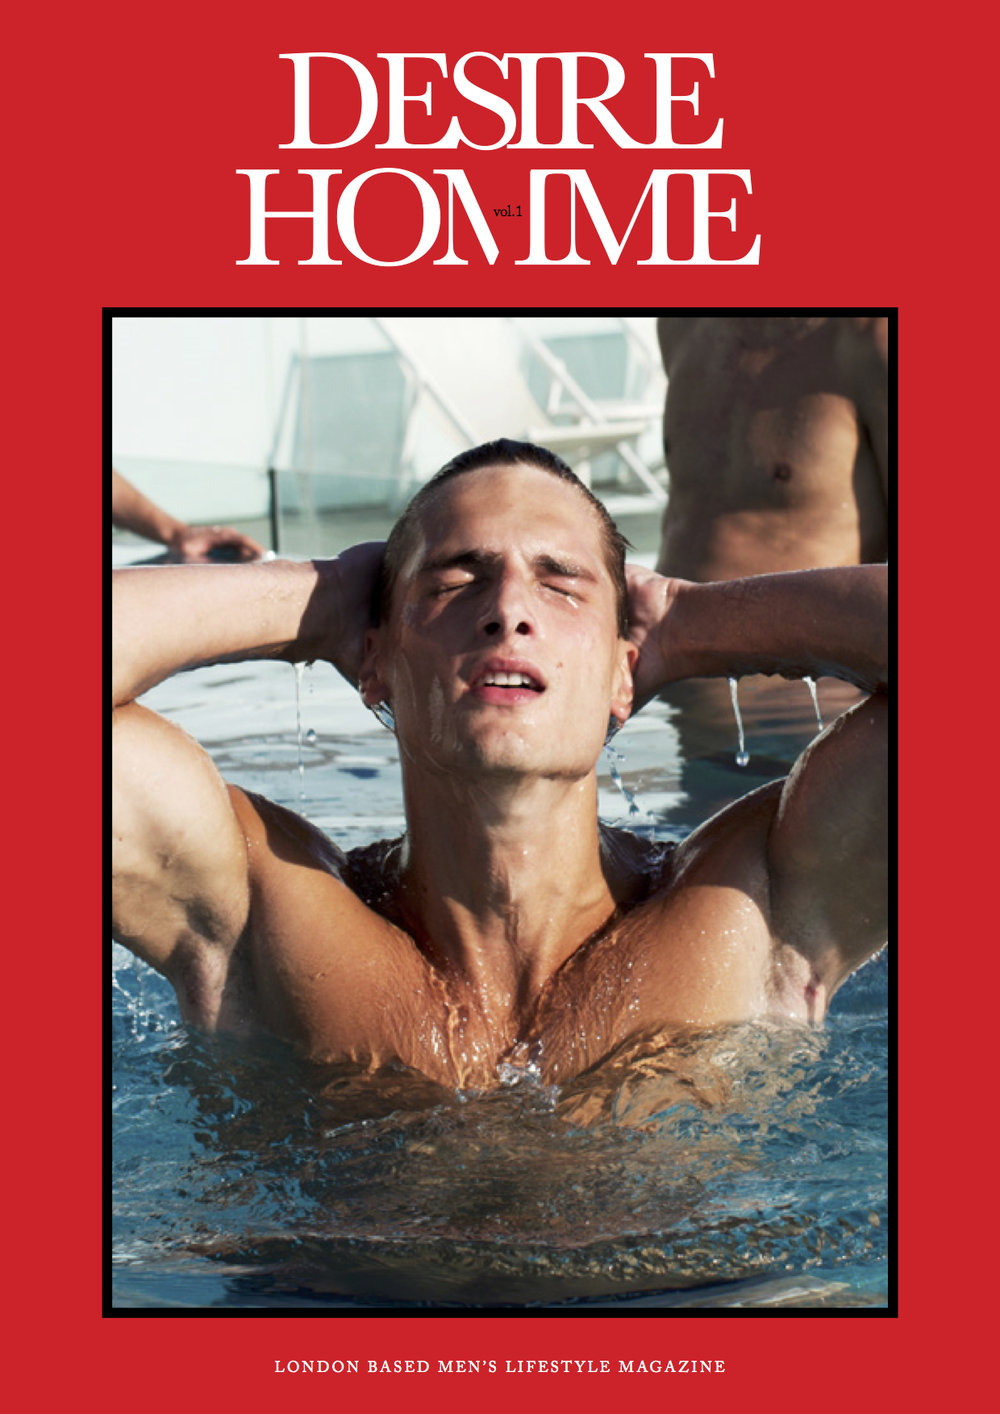 DESIRE HOMME vol. 1